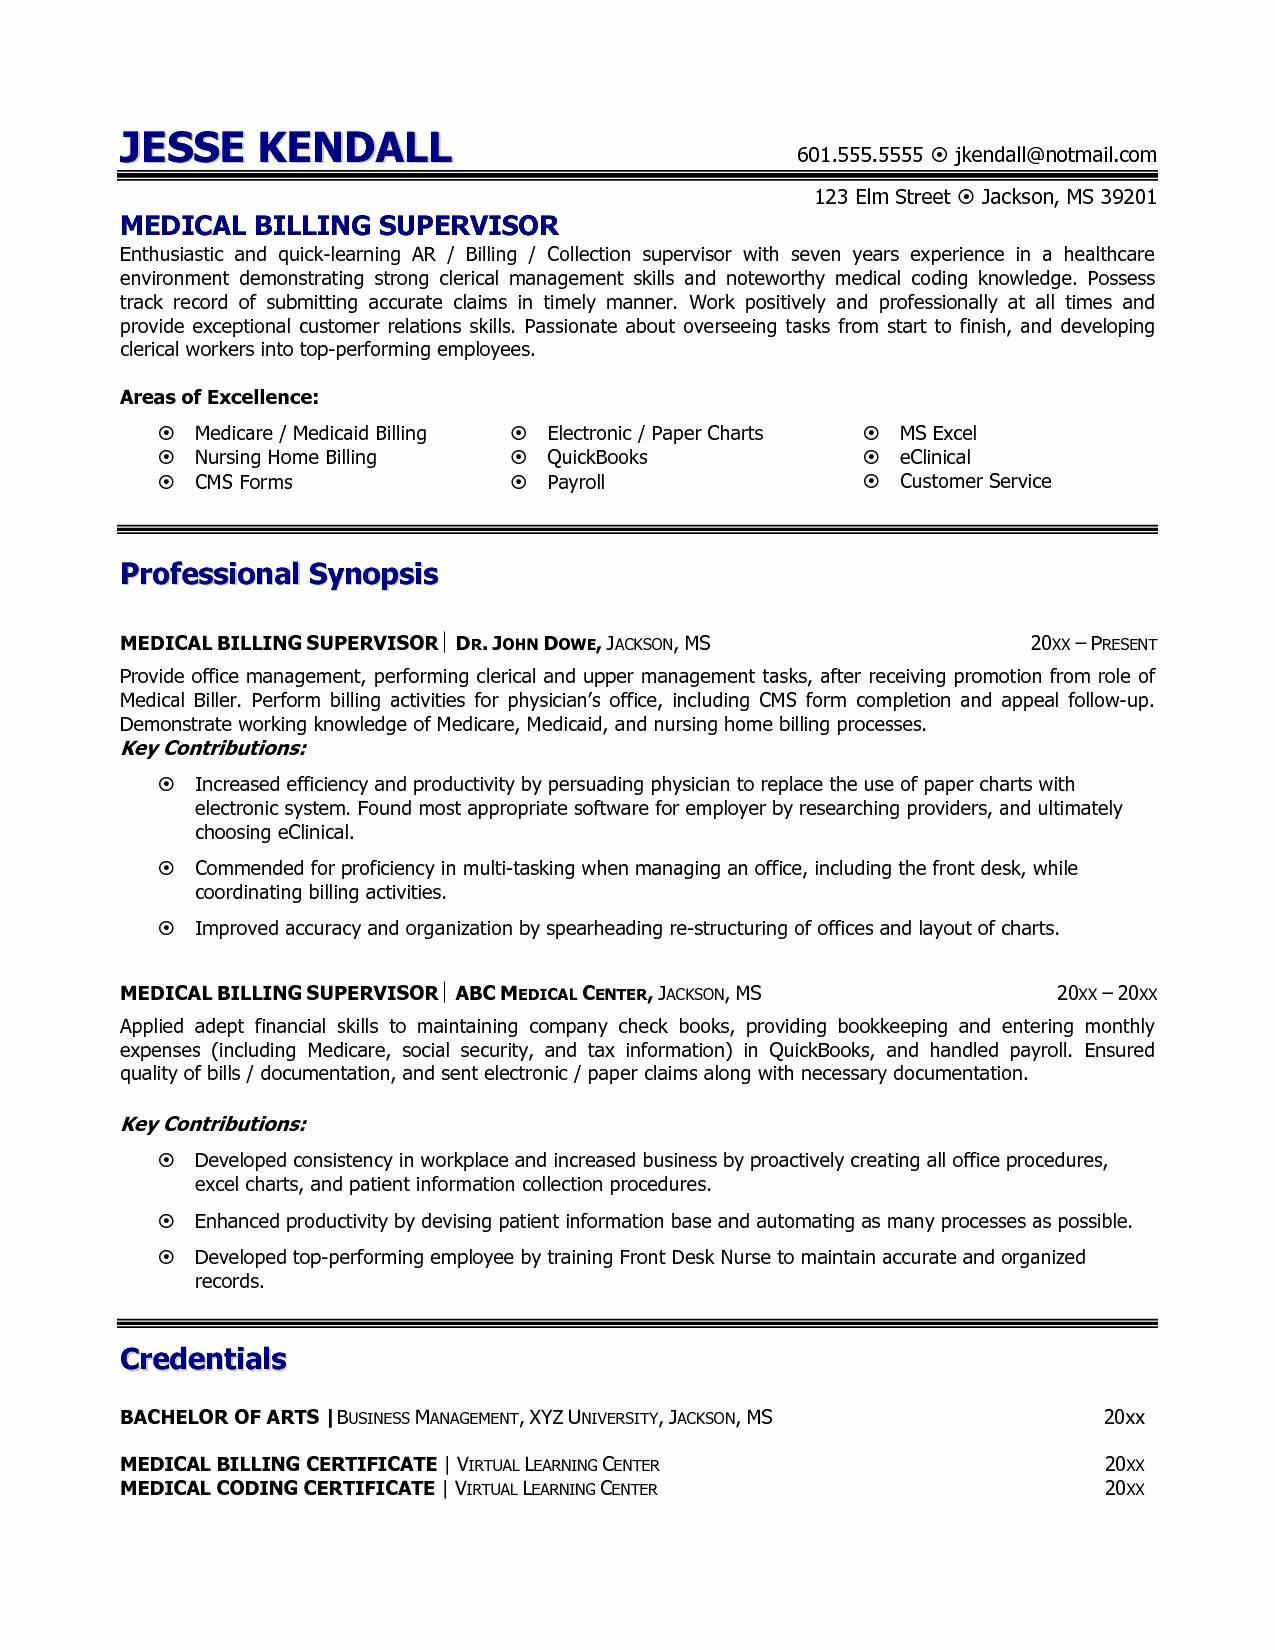 Sample Resume for Medical Coding and Billing 11 Medical Billing Resume Example Collection